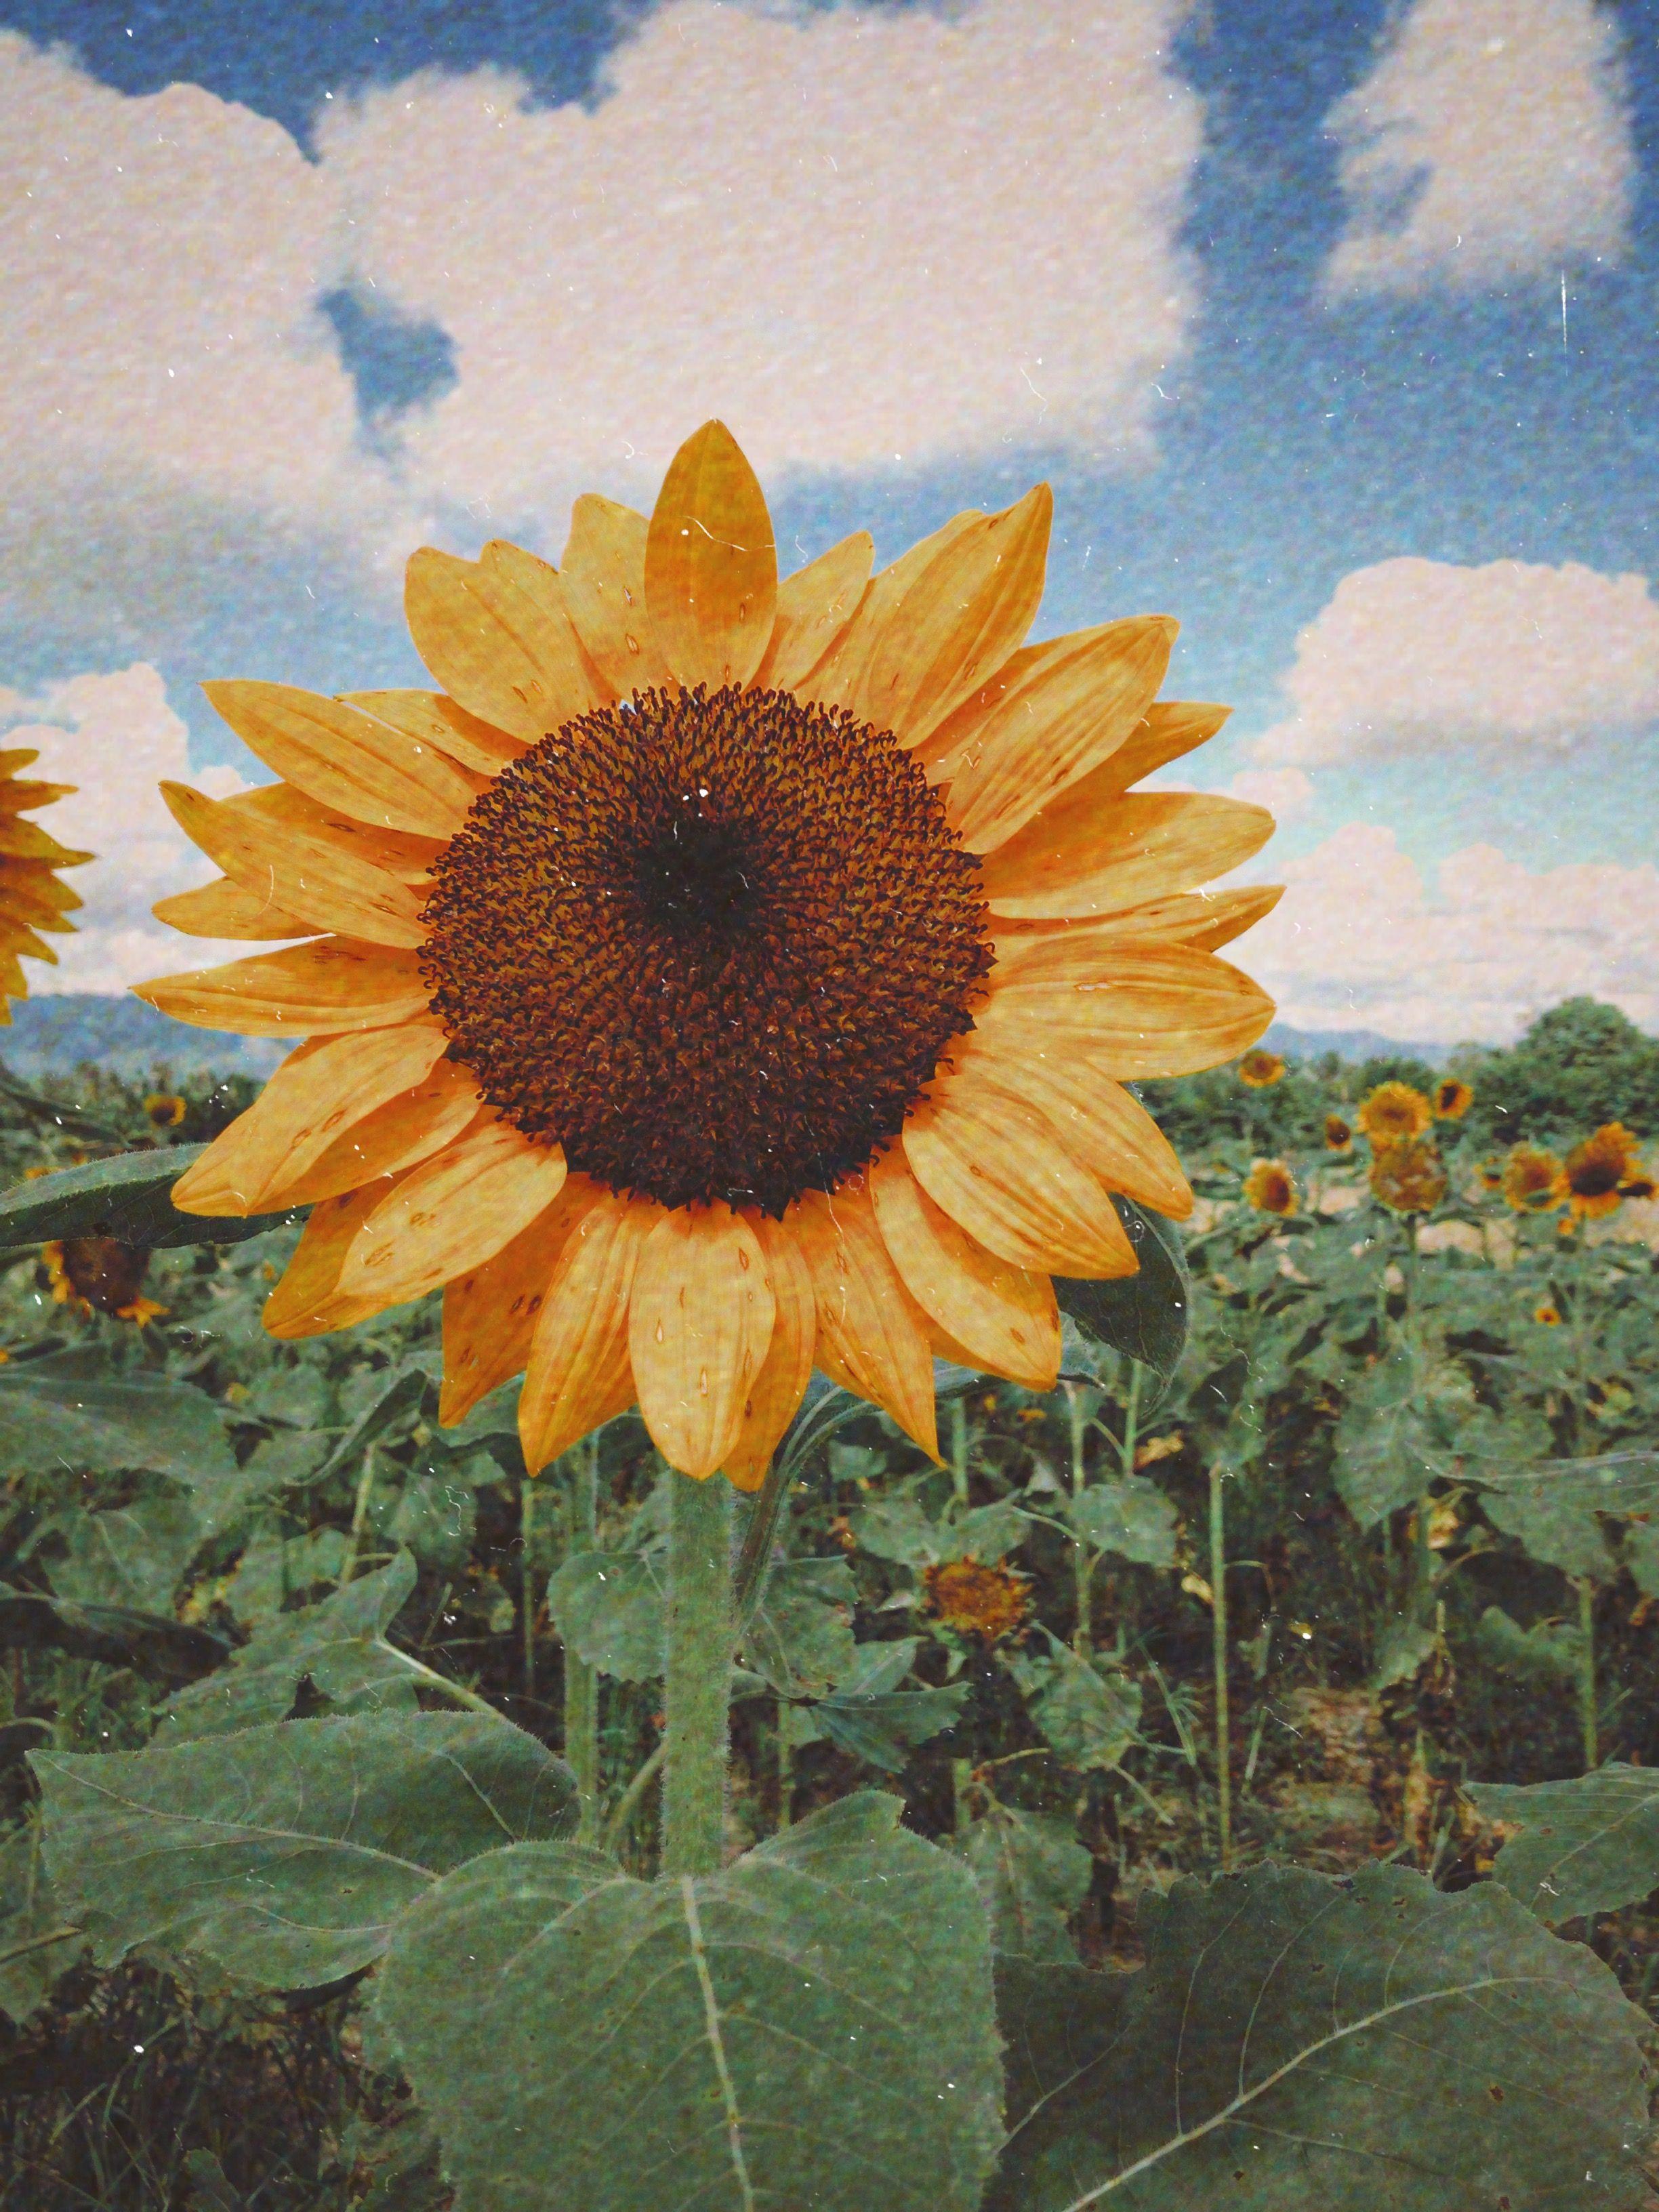 Sunflower sunflowerPH wallpaper sunflowerwallpaper